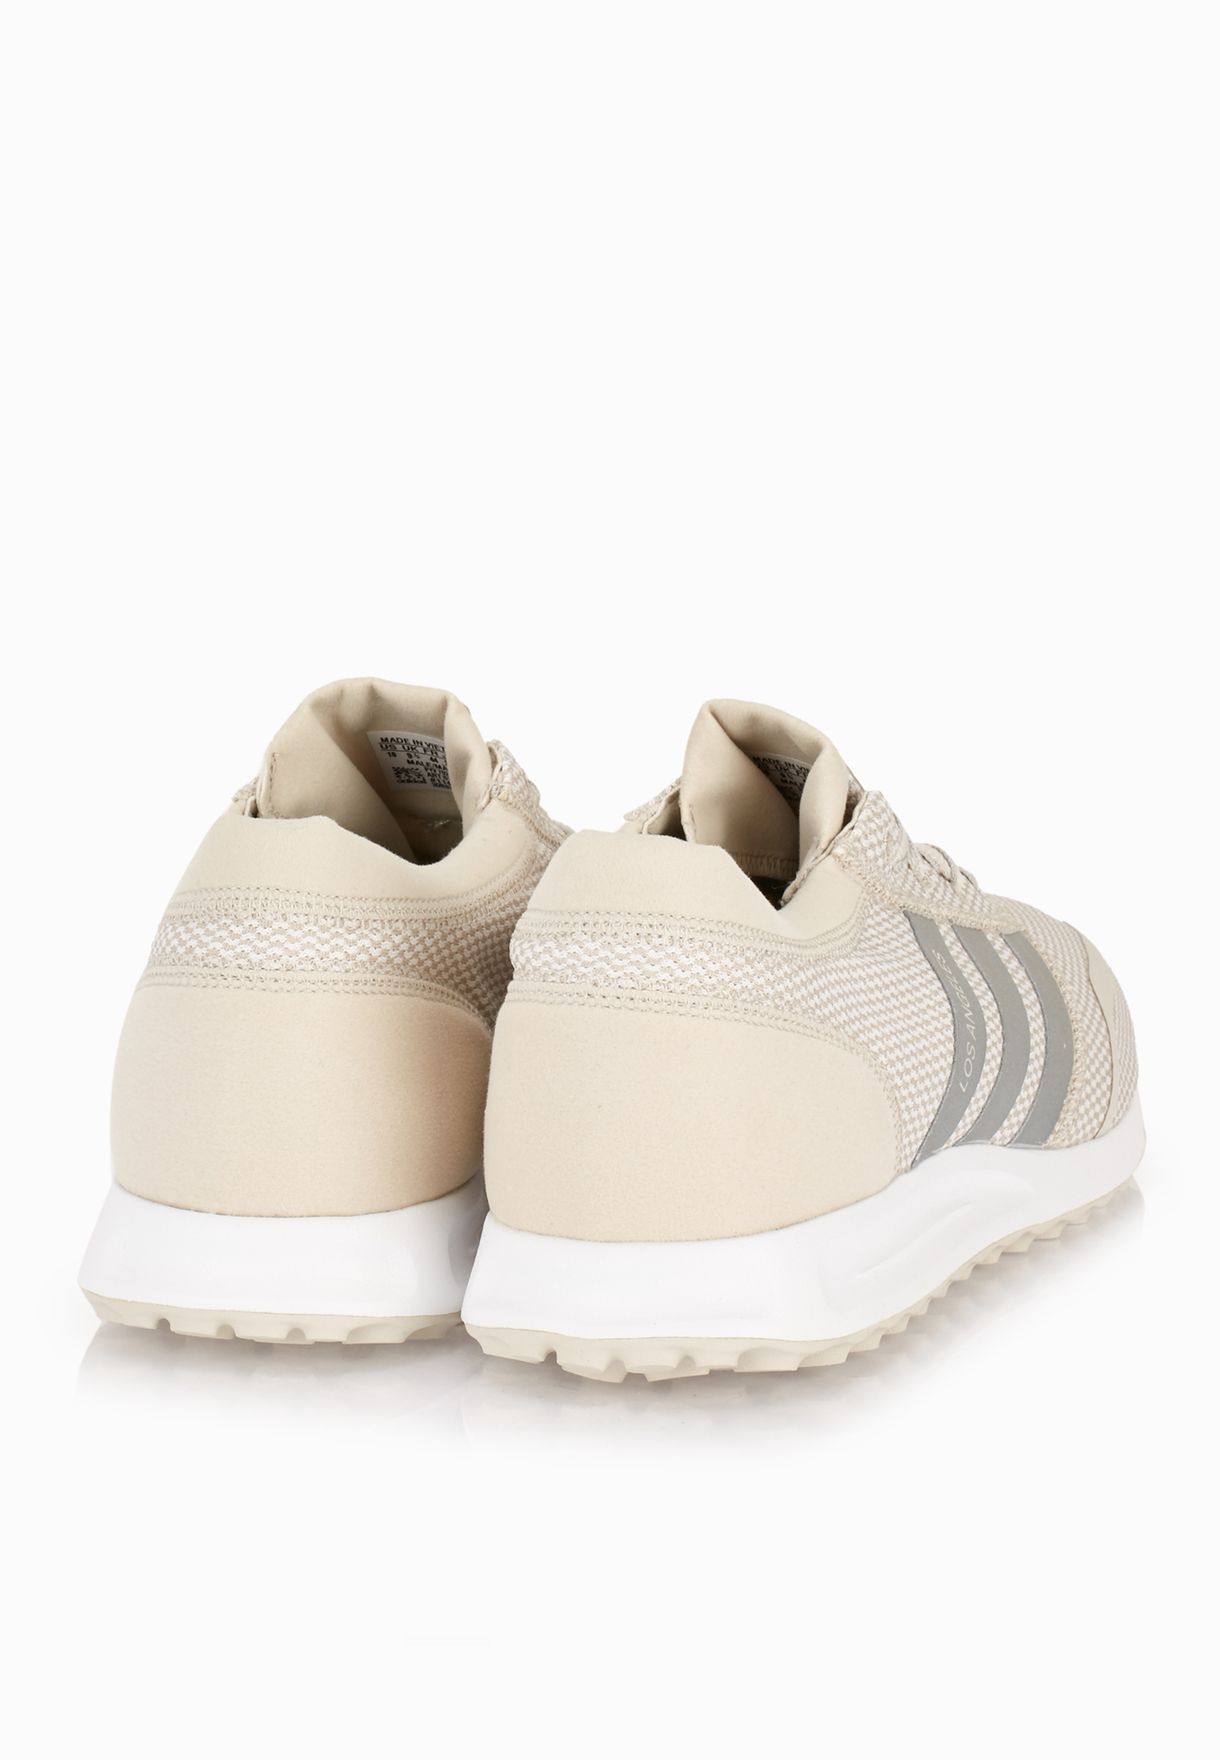 adidas Originals Mens Los Angeles Trainers Beige Size UK 13.5 S75989